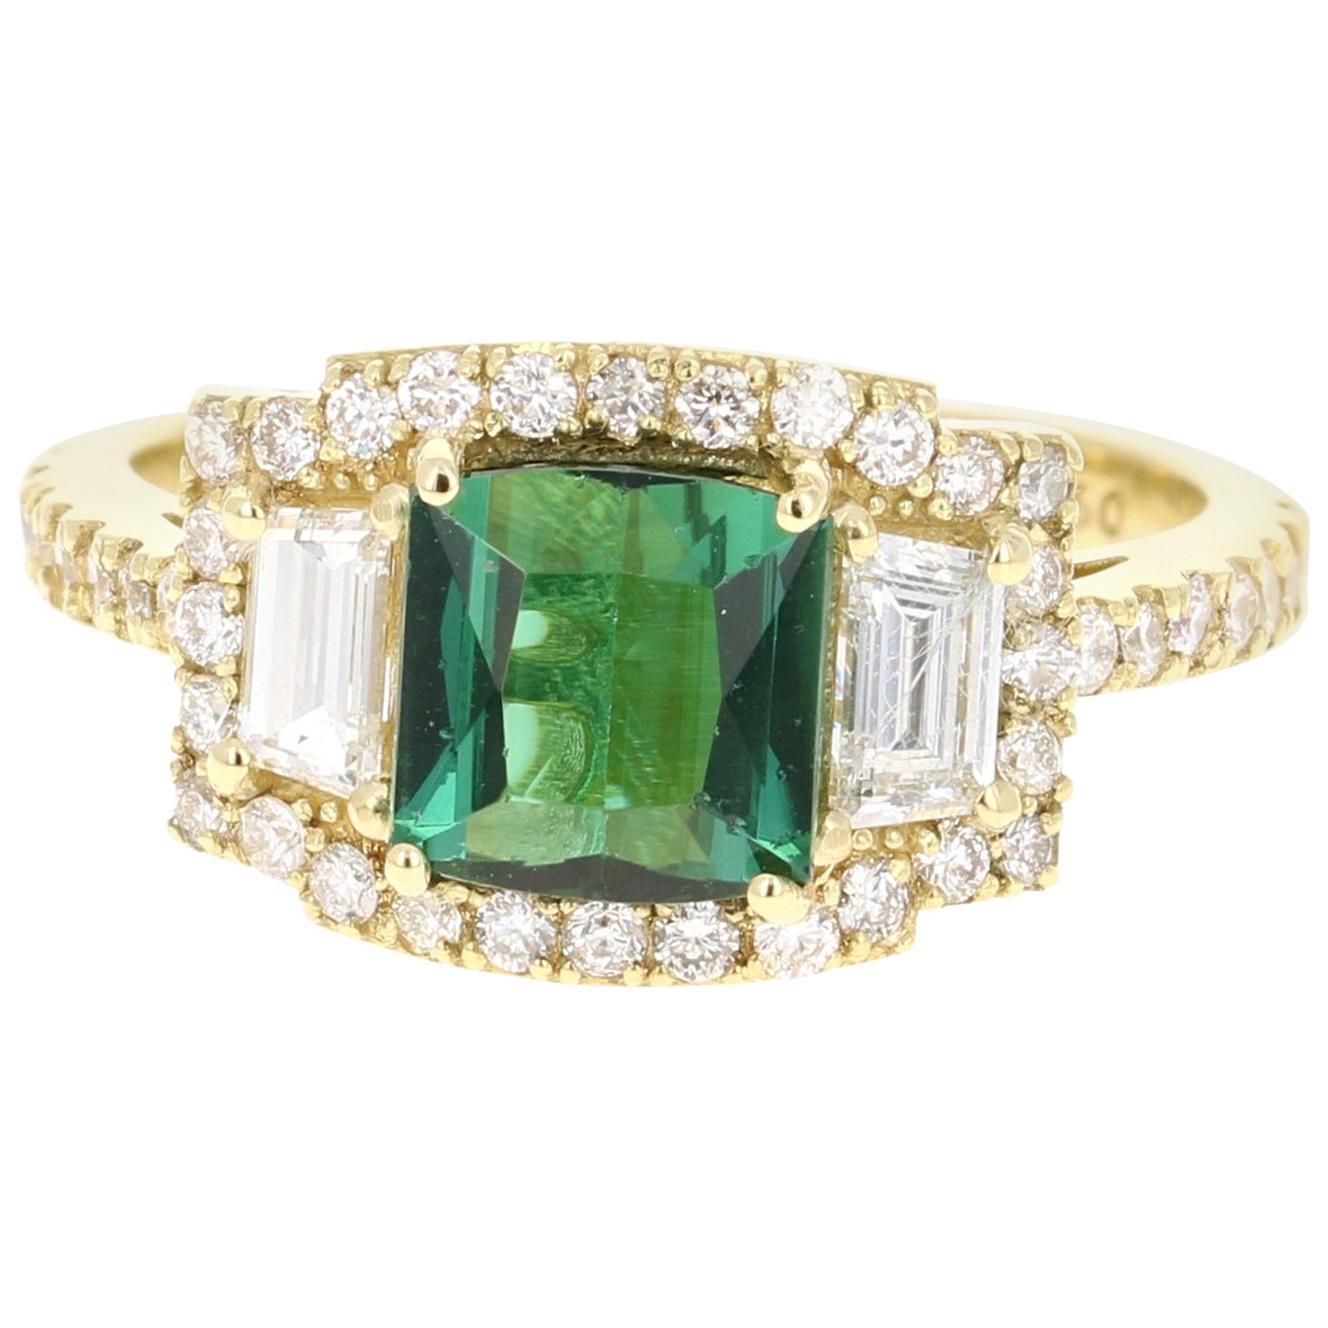 2.55 Carat Green Tourmaline Diamond 18 Karat Yellow Gold Three-Stone Ring